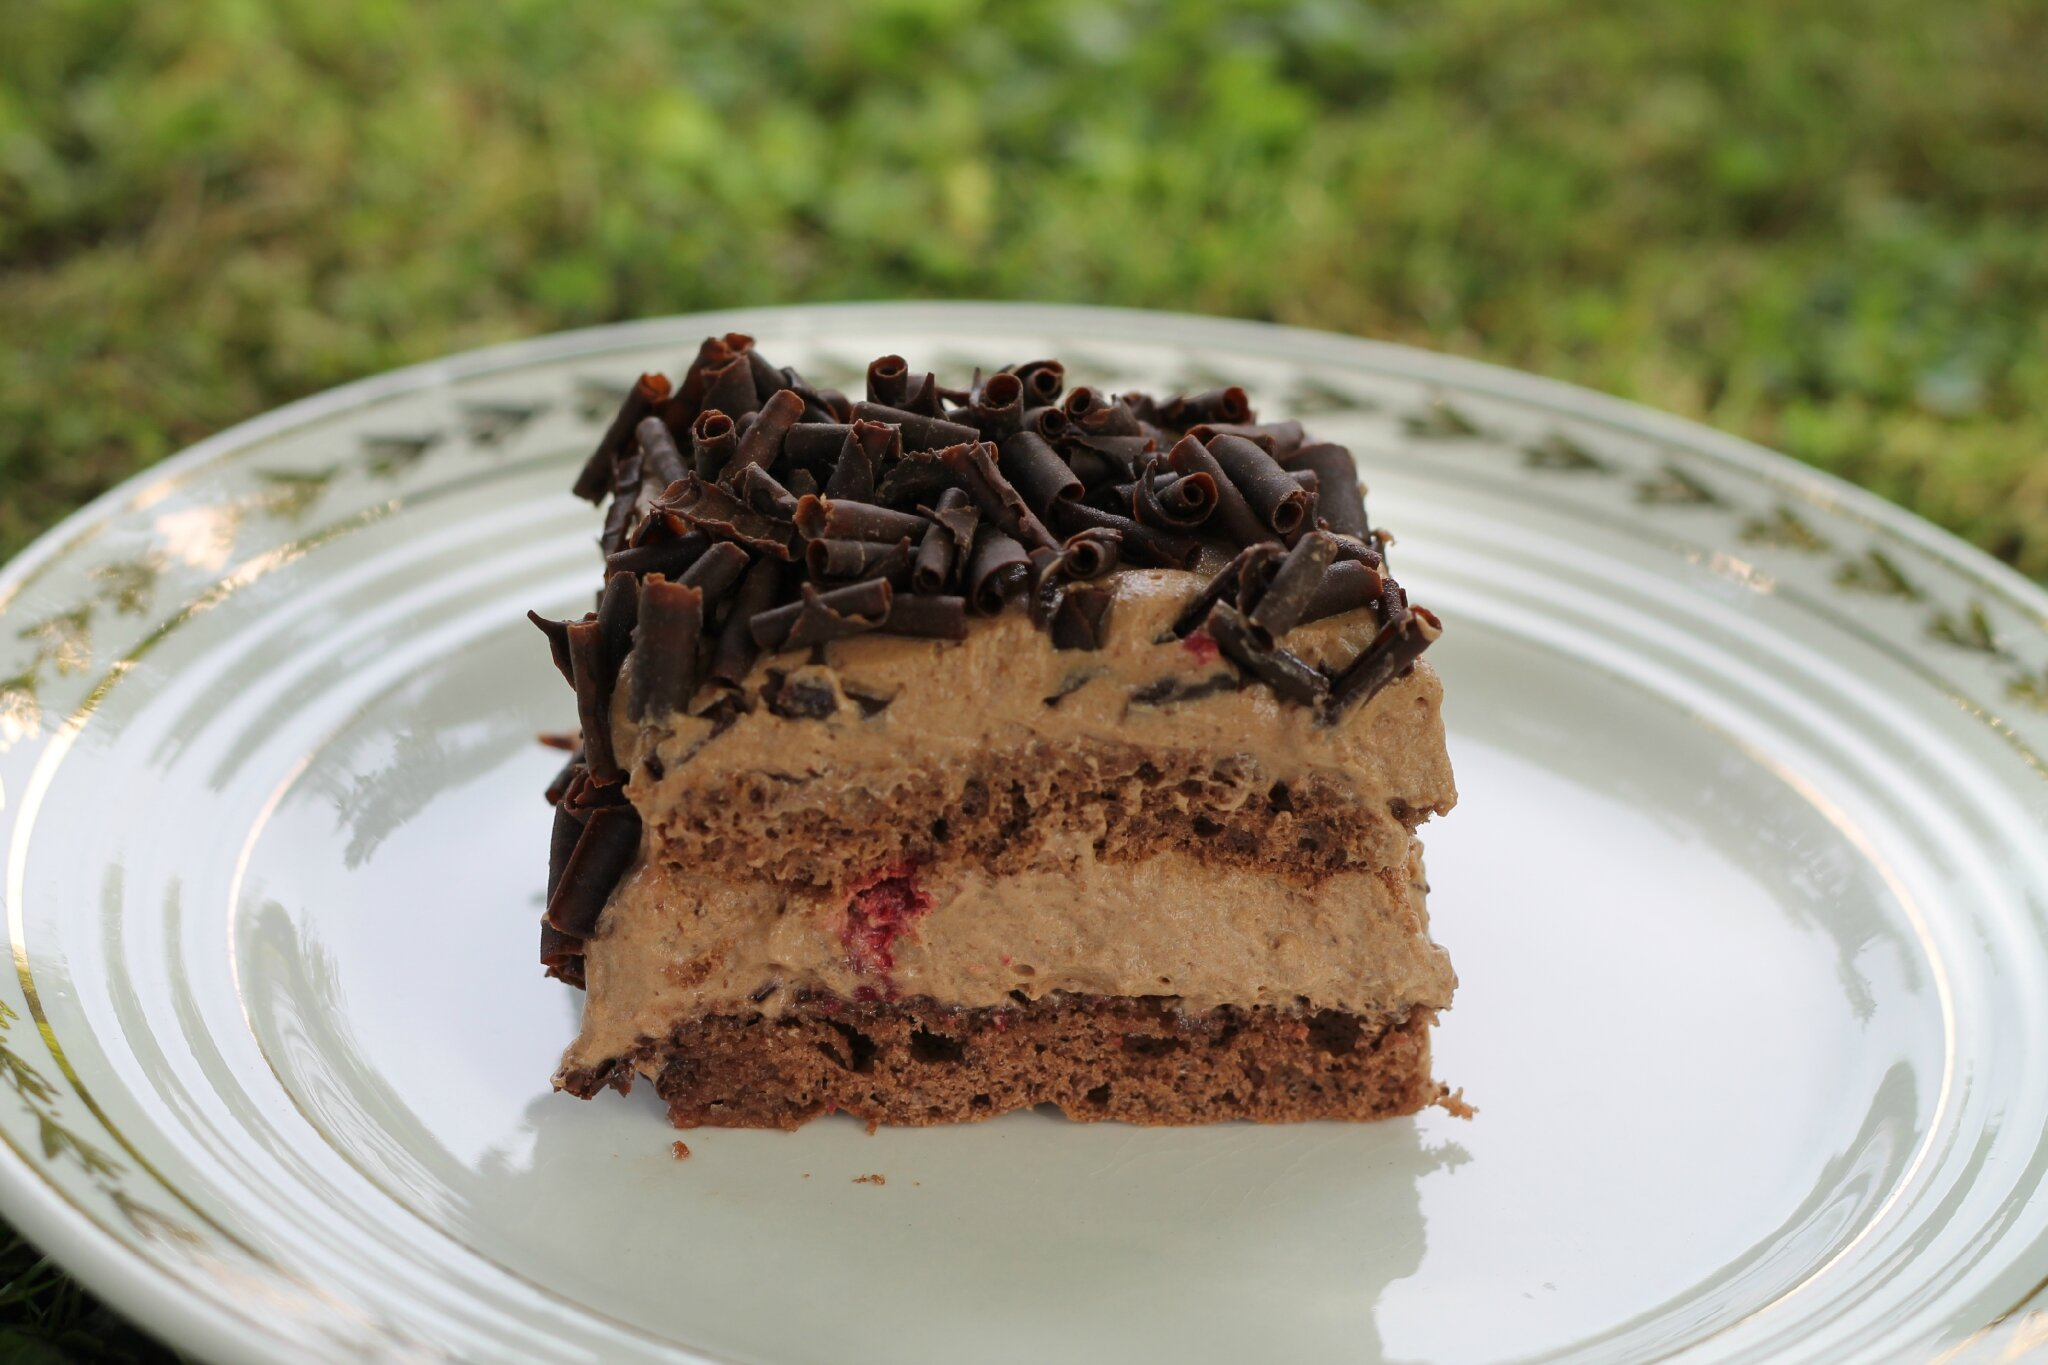 Le chocolat/framboises de C.Felder